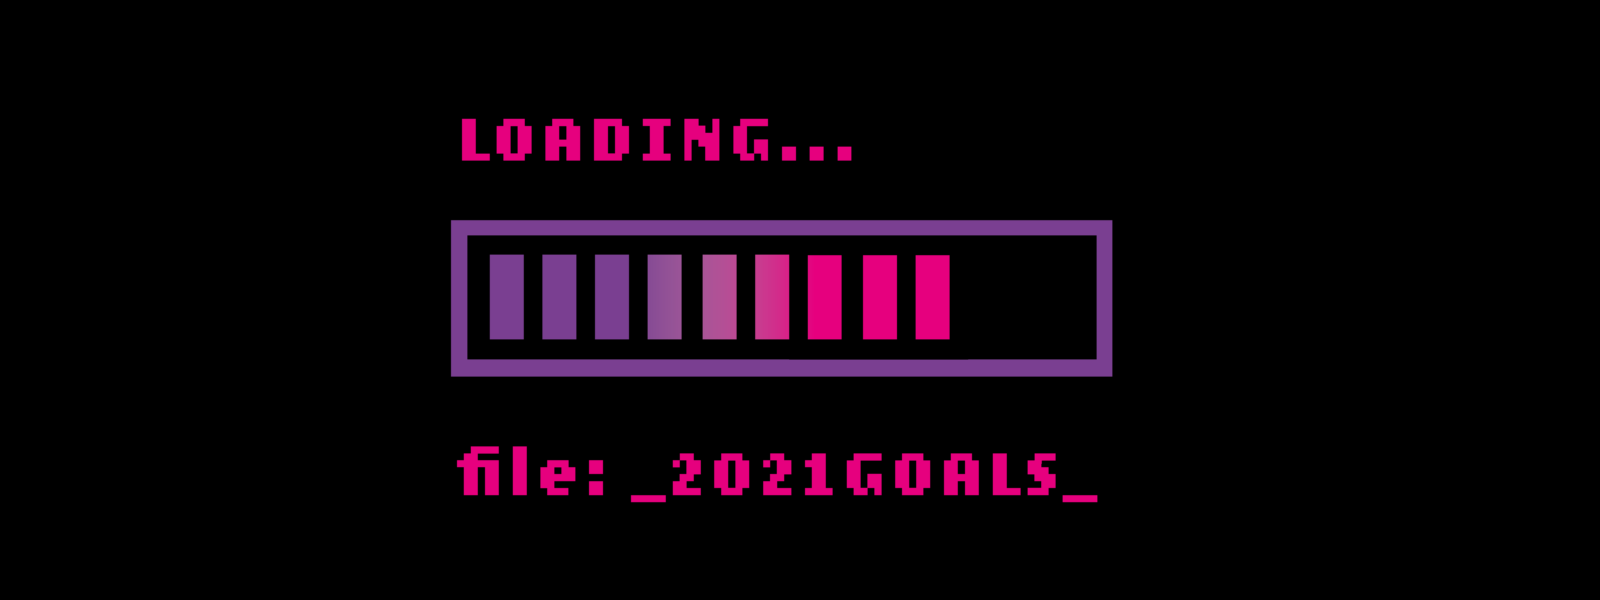 loading 2021 goals